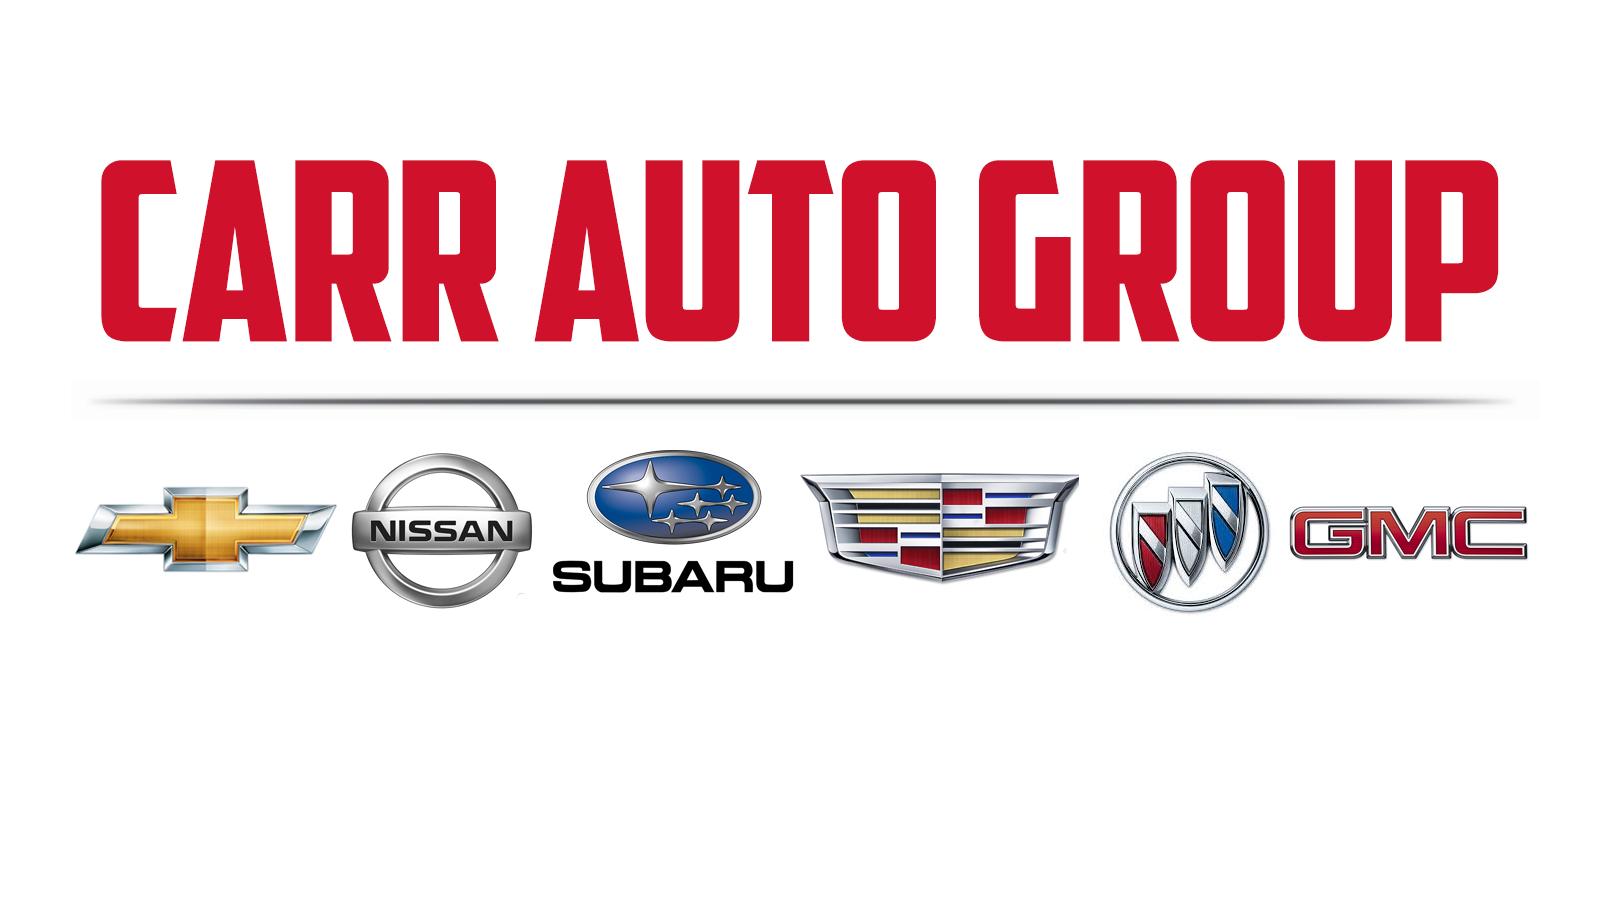 Carr Auto Group Company Logo